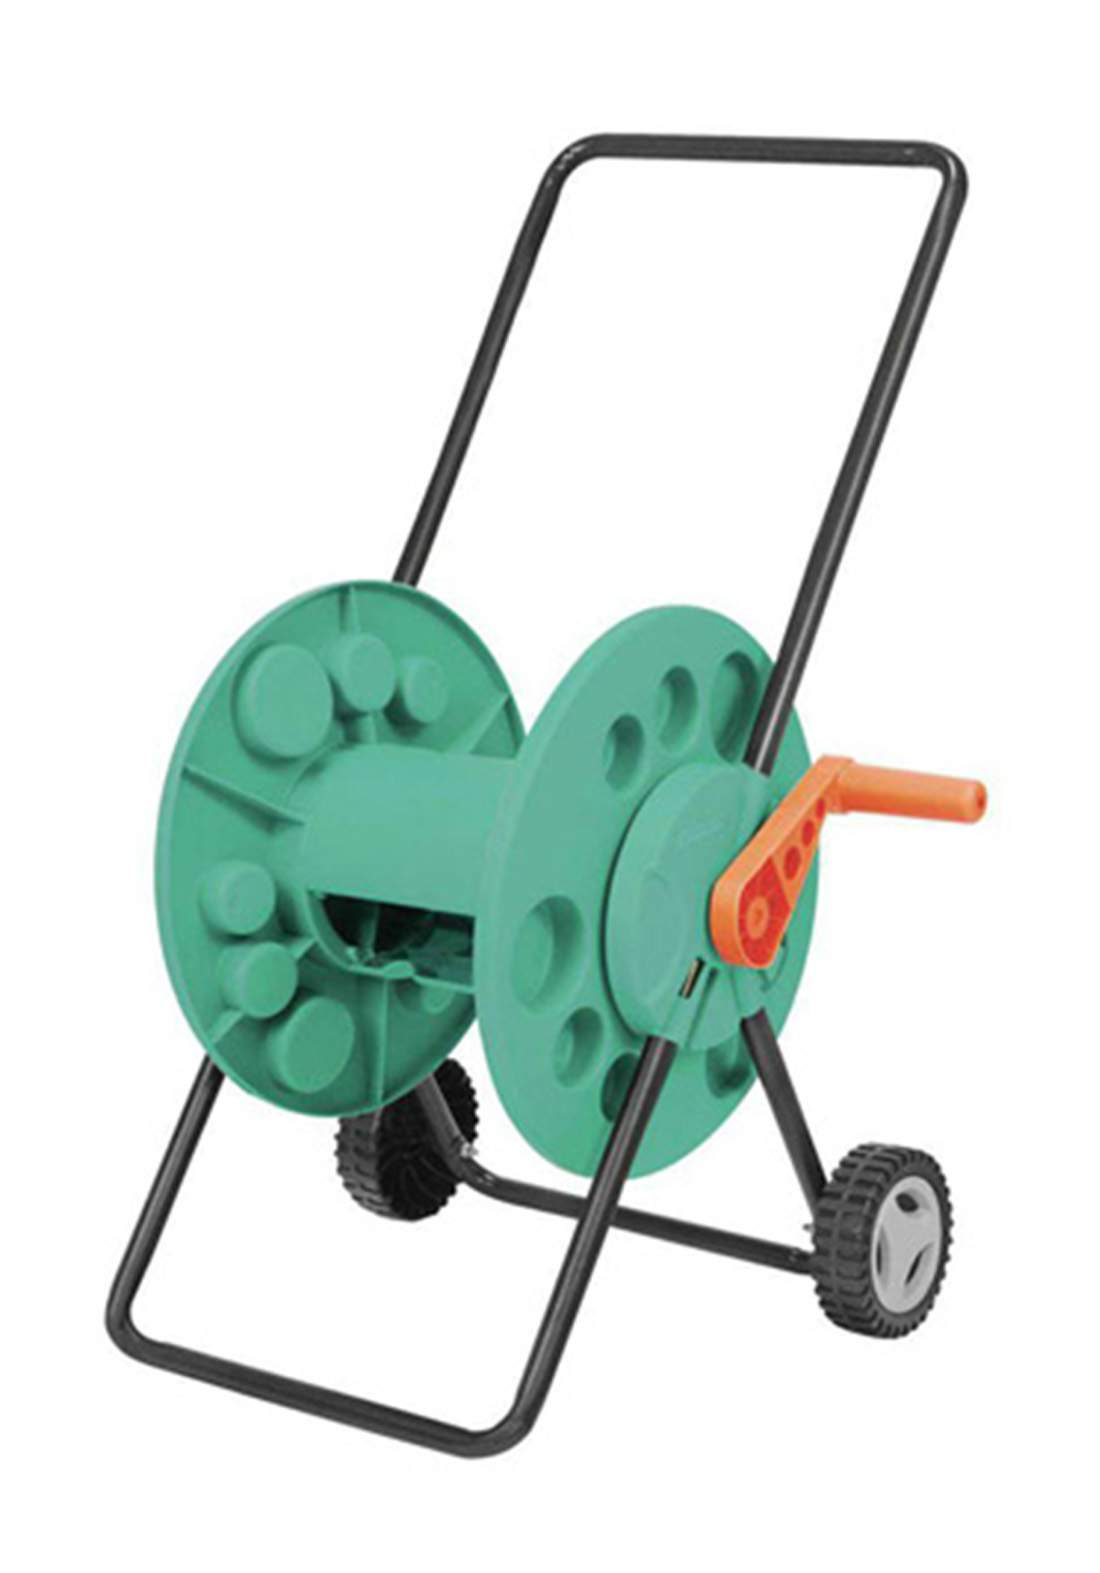 Tramontina 78595/000 Hose Reel With Wheels بكرة متنقلة لخرطوم المياه